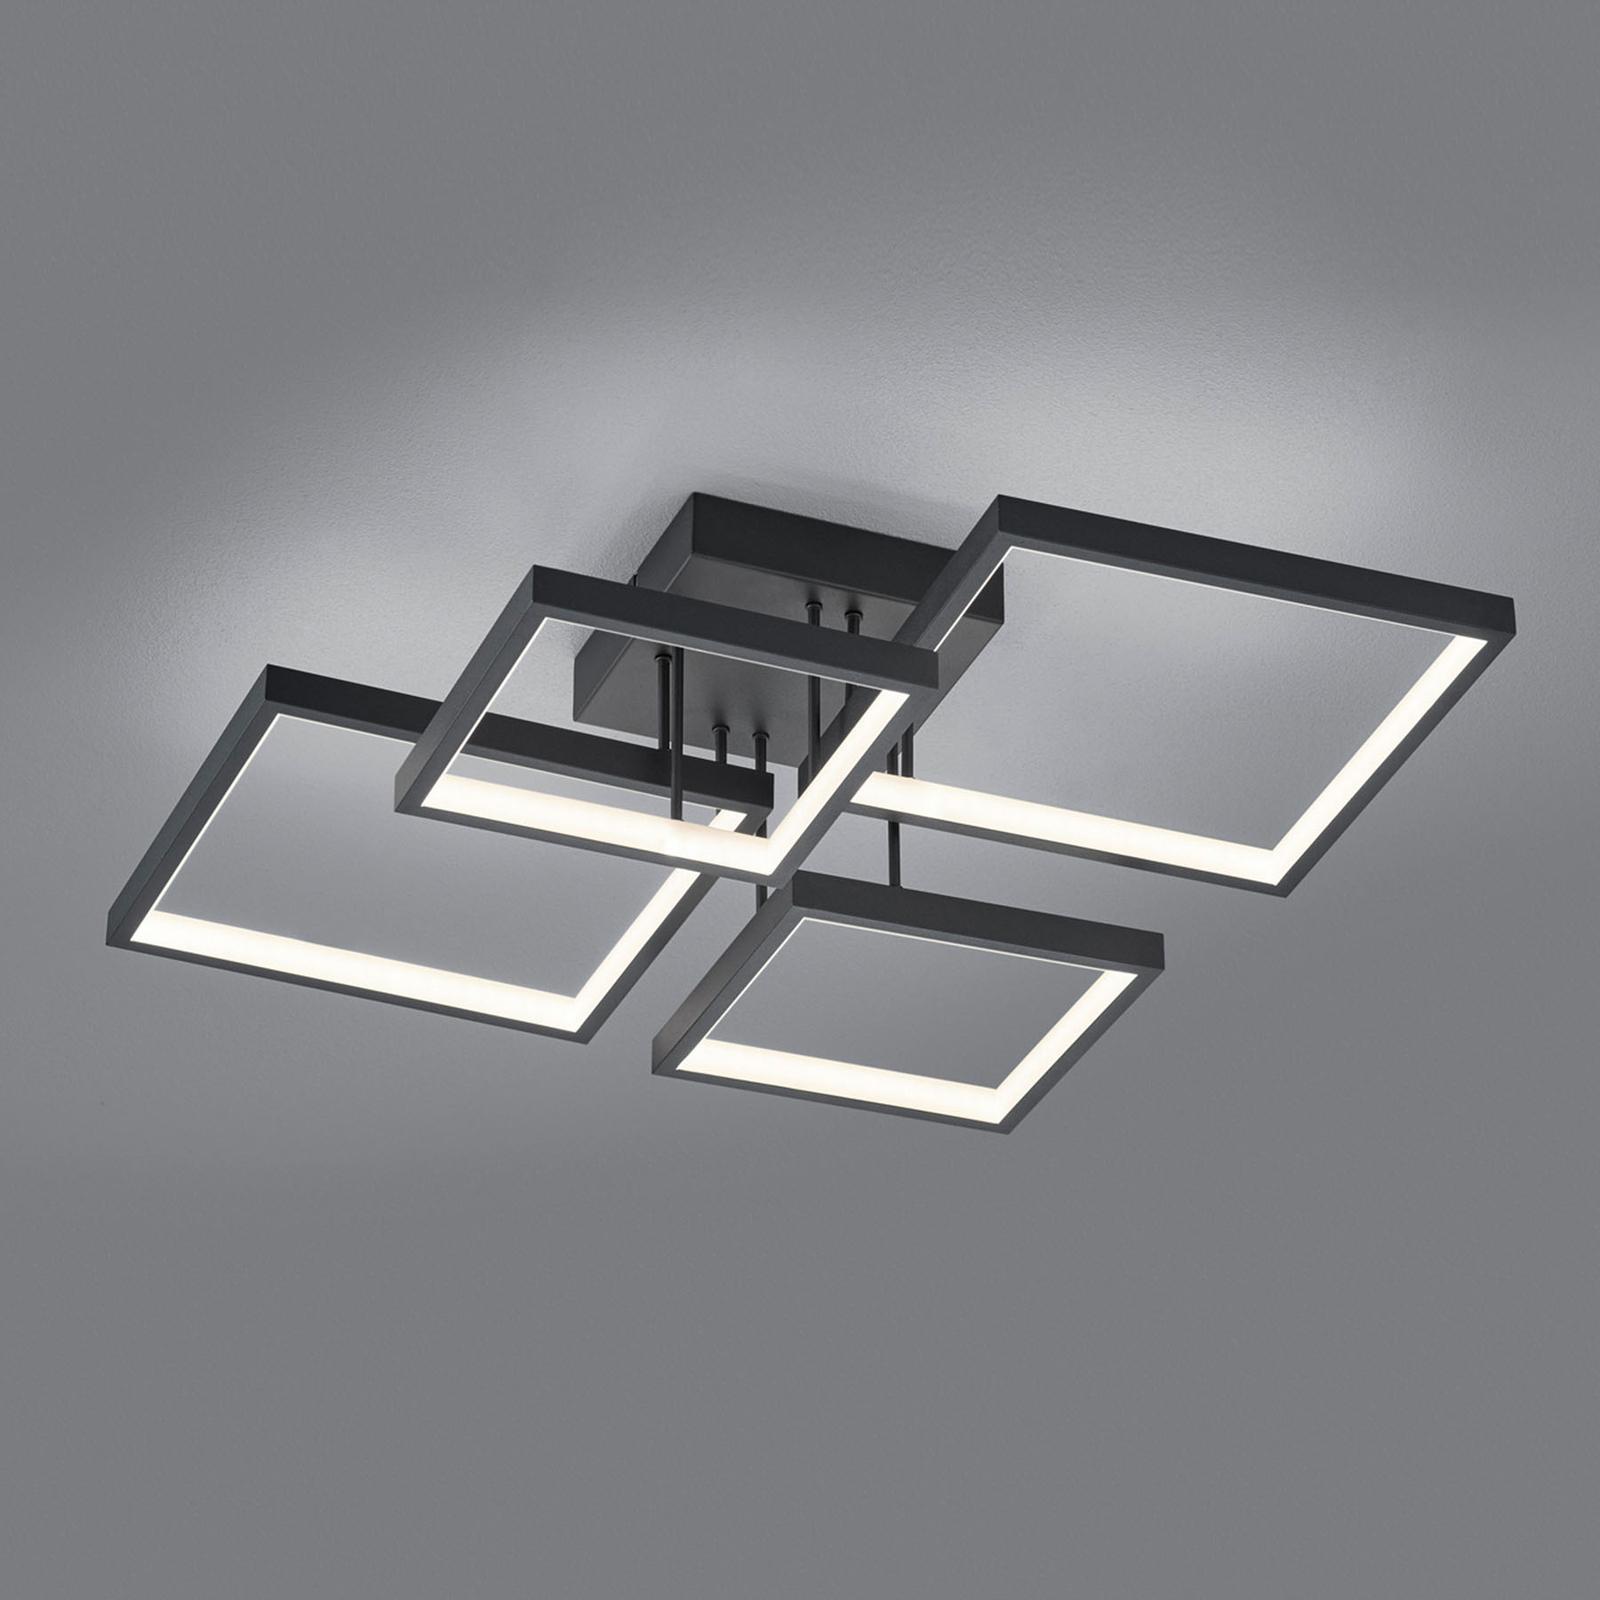 Lampa sufitowa LED Sorrento 52x52cm, czarna matowa